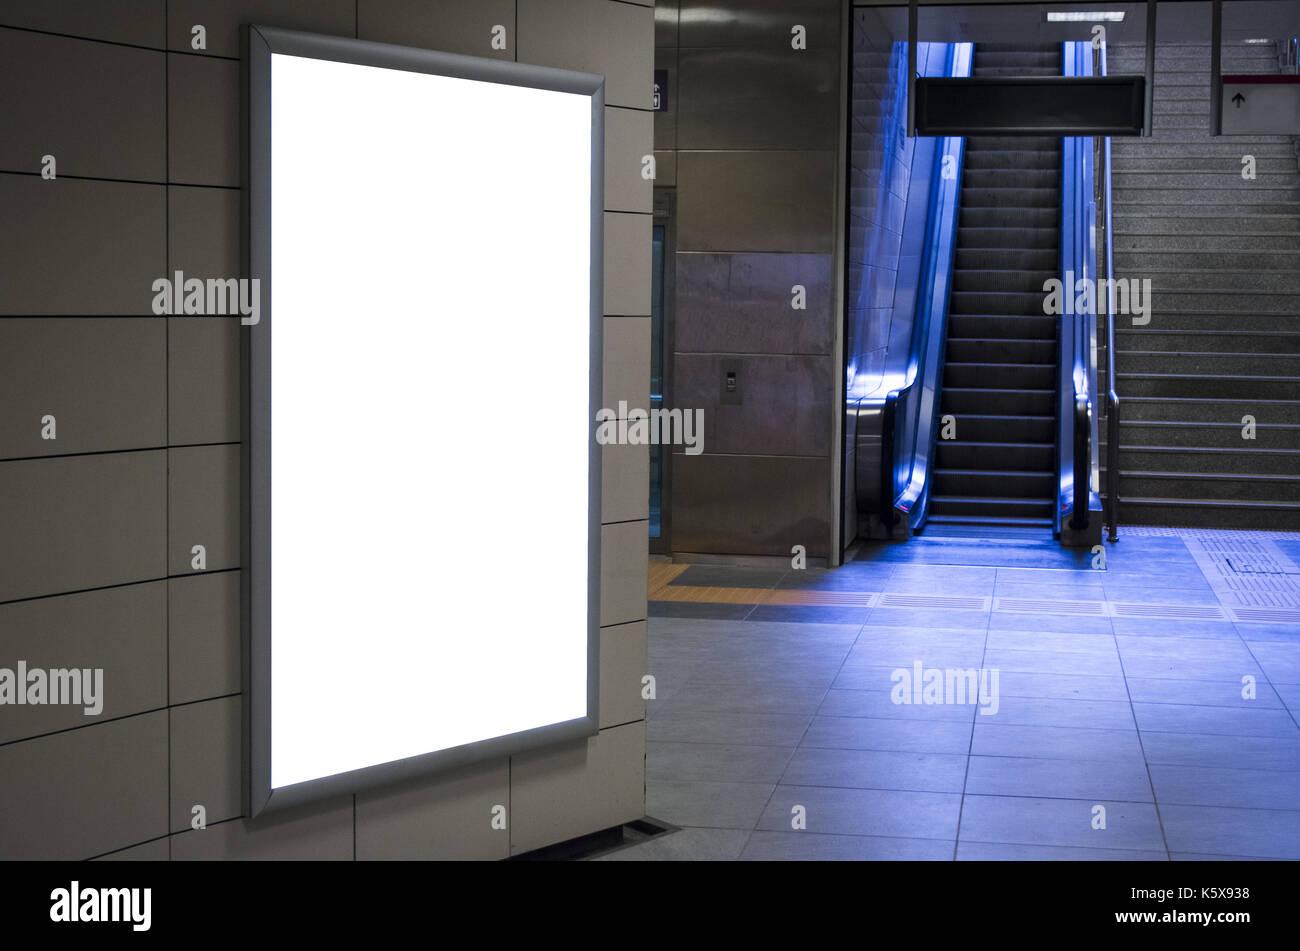 Empty billboard with escalator background - Stock Image